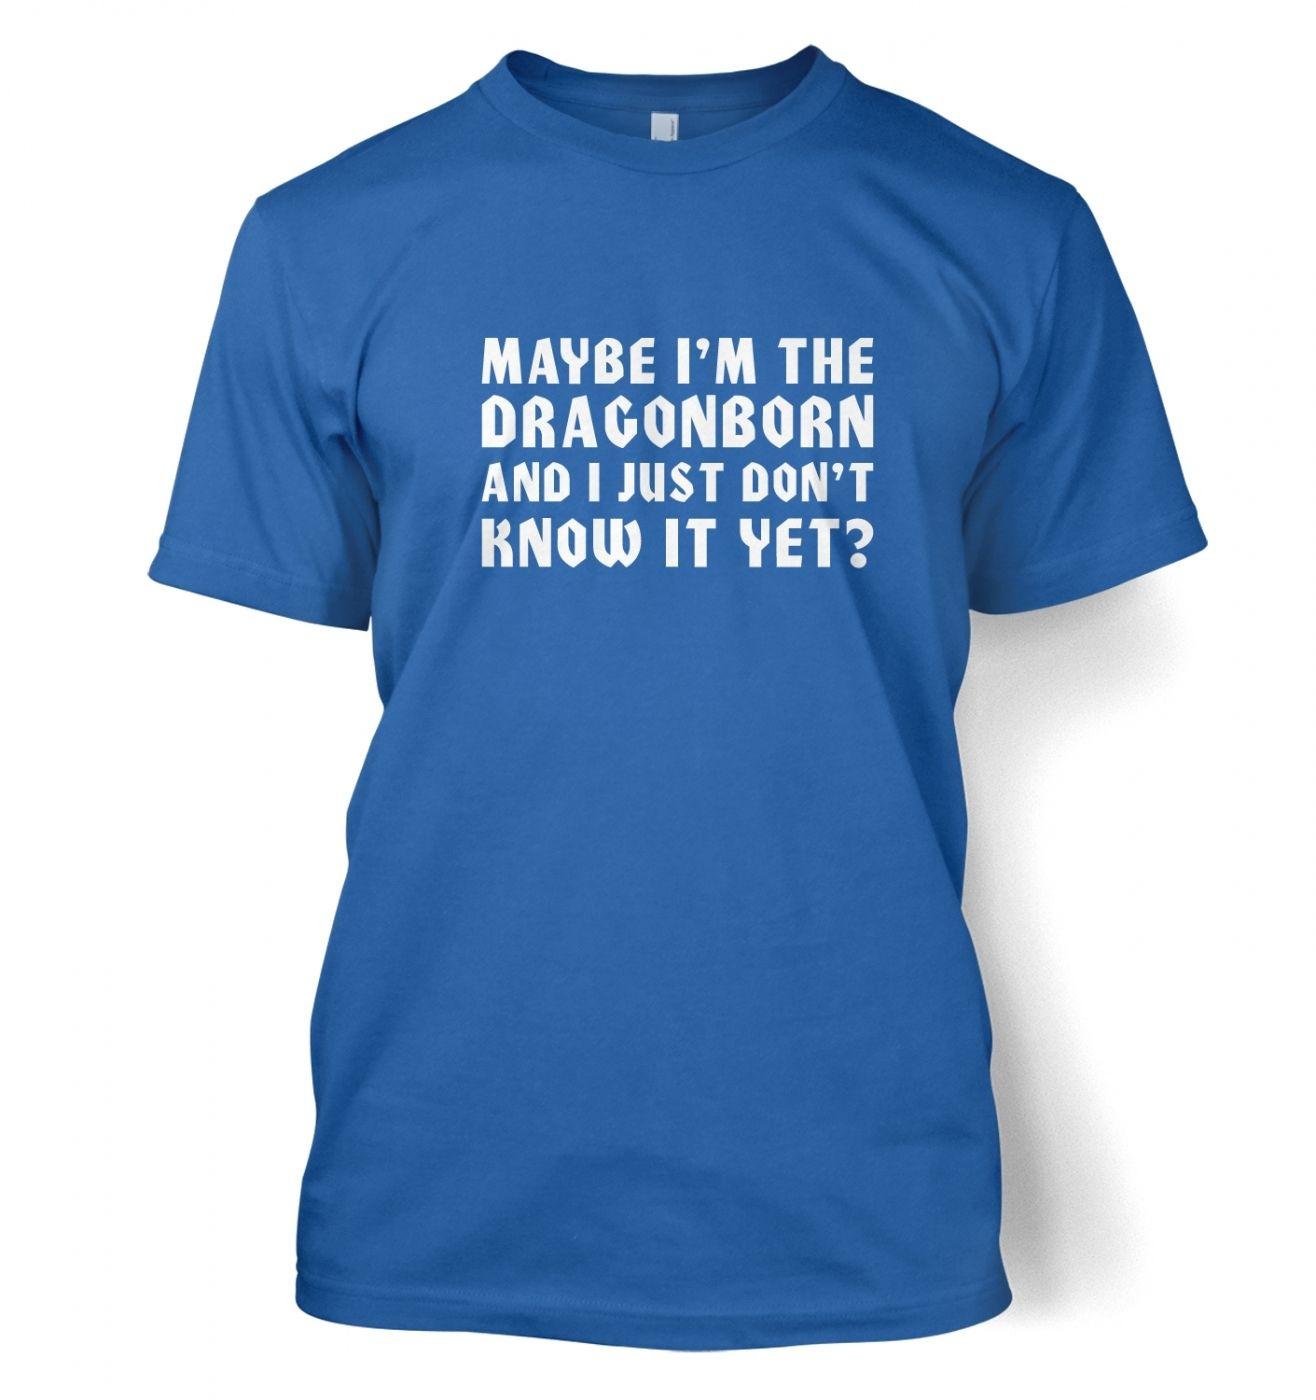 Maybe I'm The Dragonborn men's t-shirt